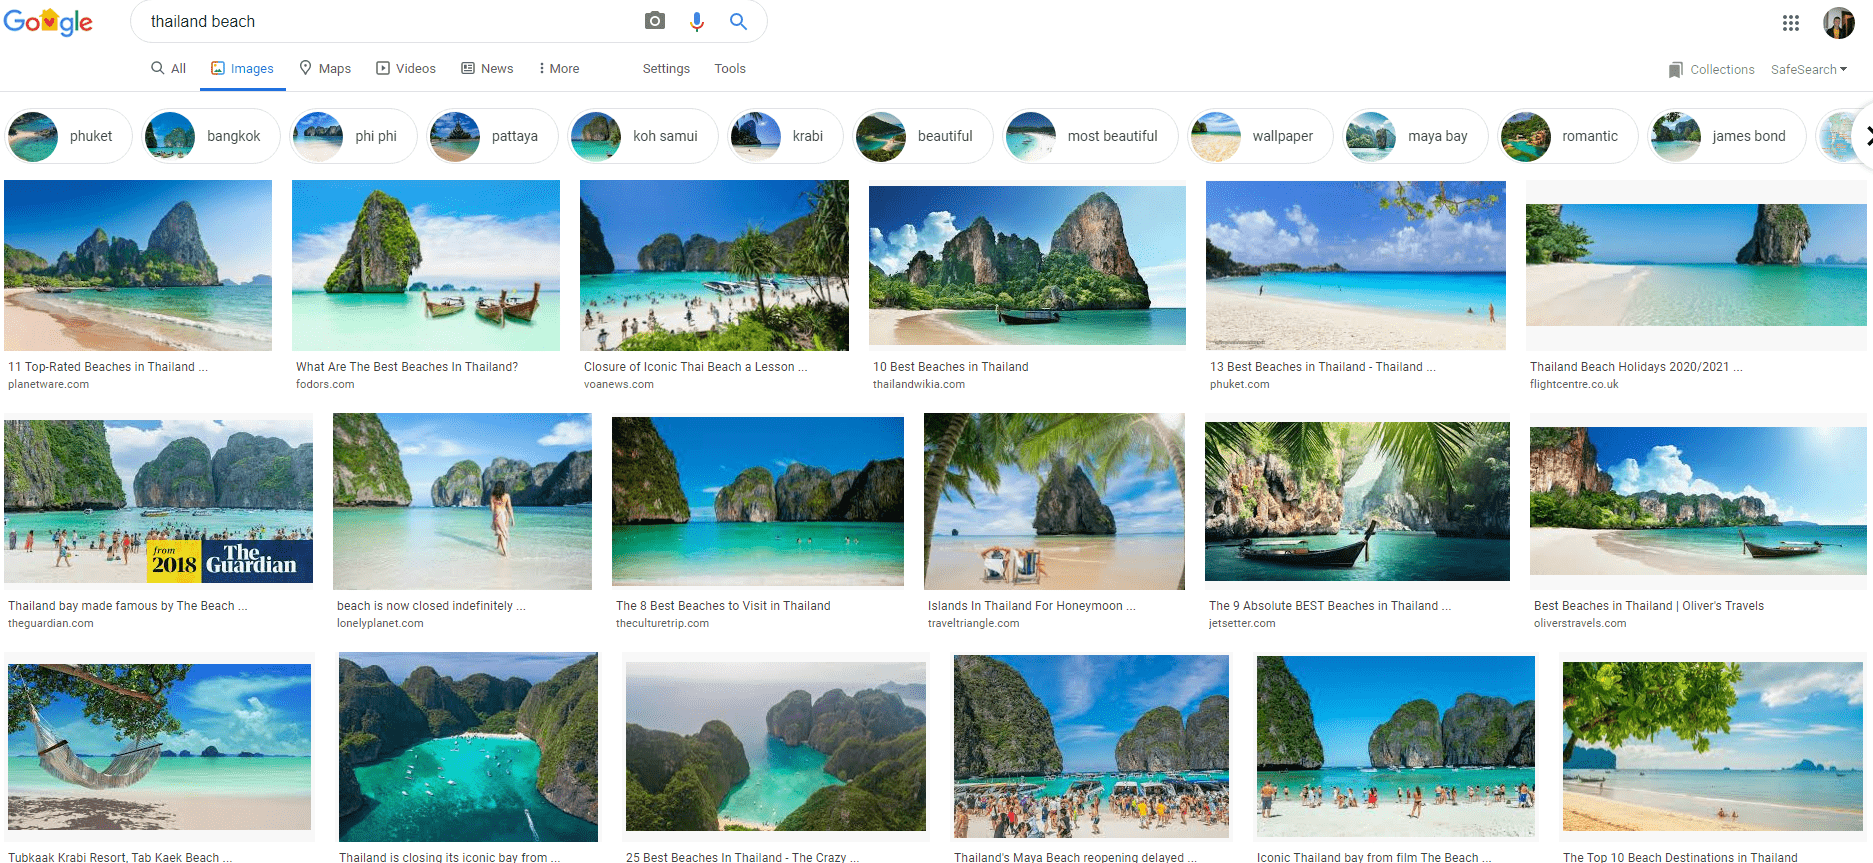 square-images-google